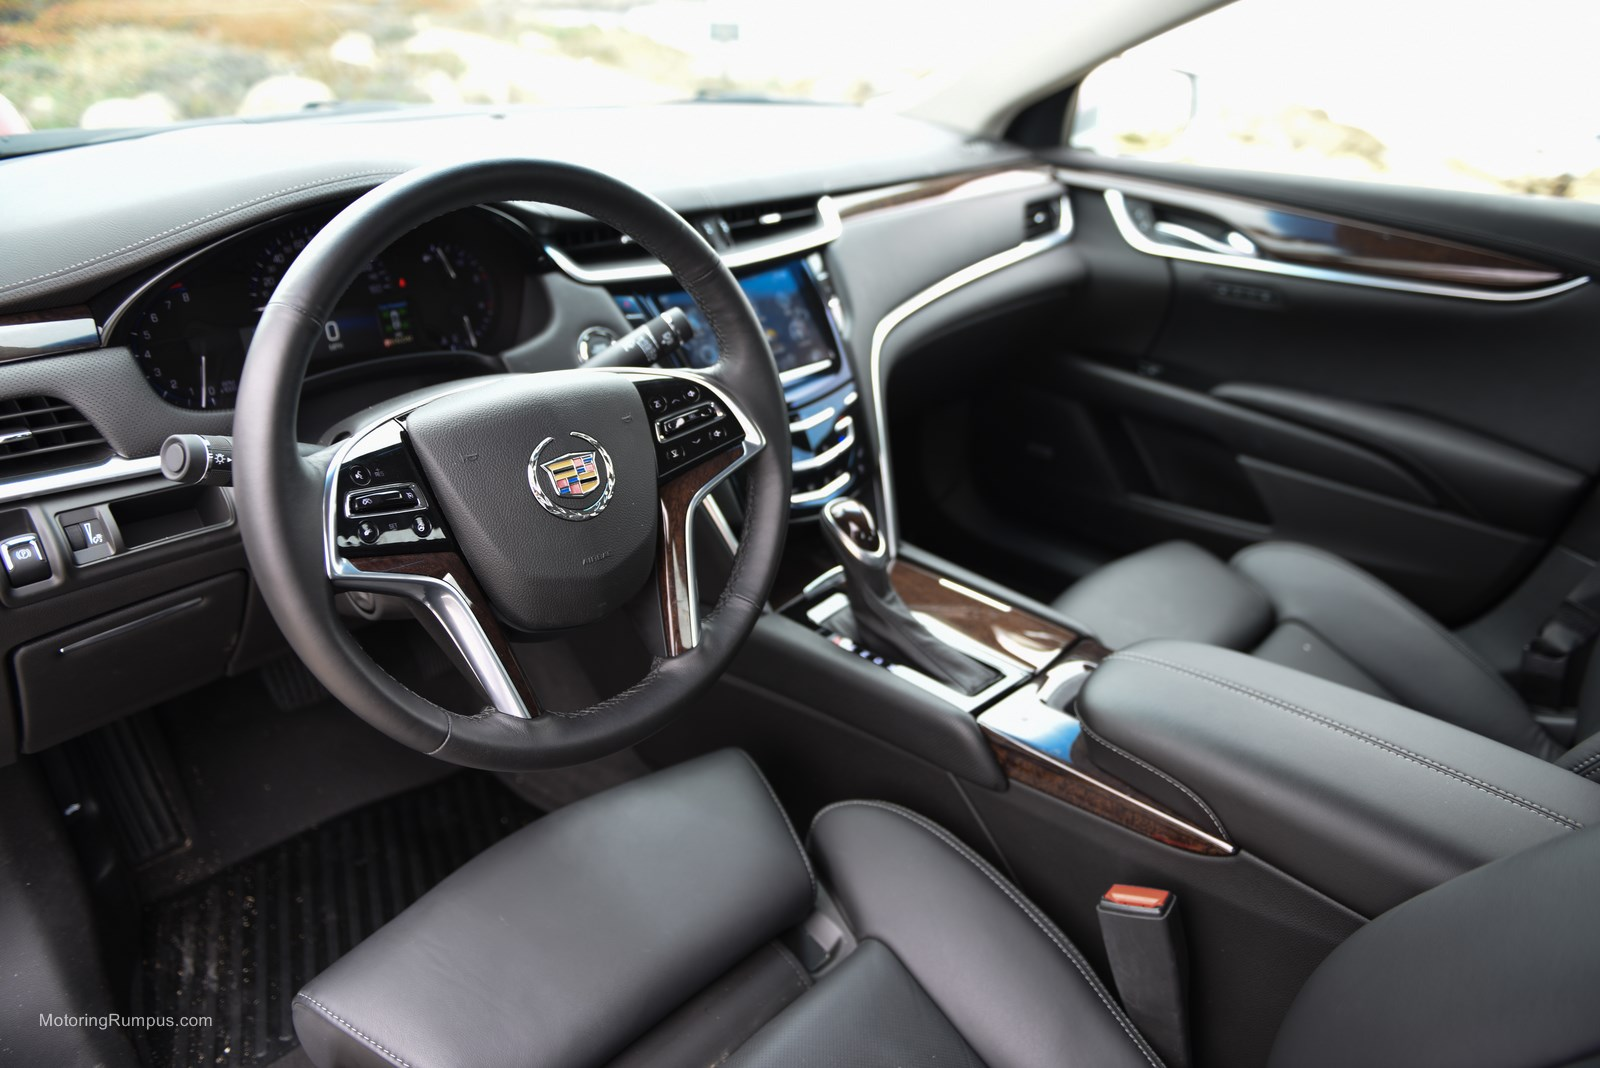 2014 Cadillac XTS Black Interior